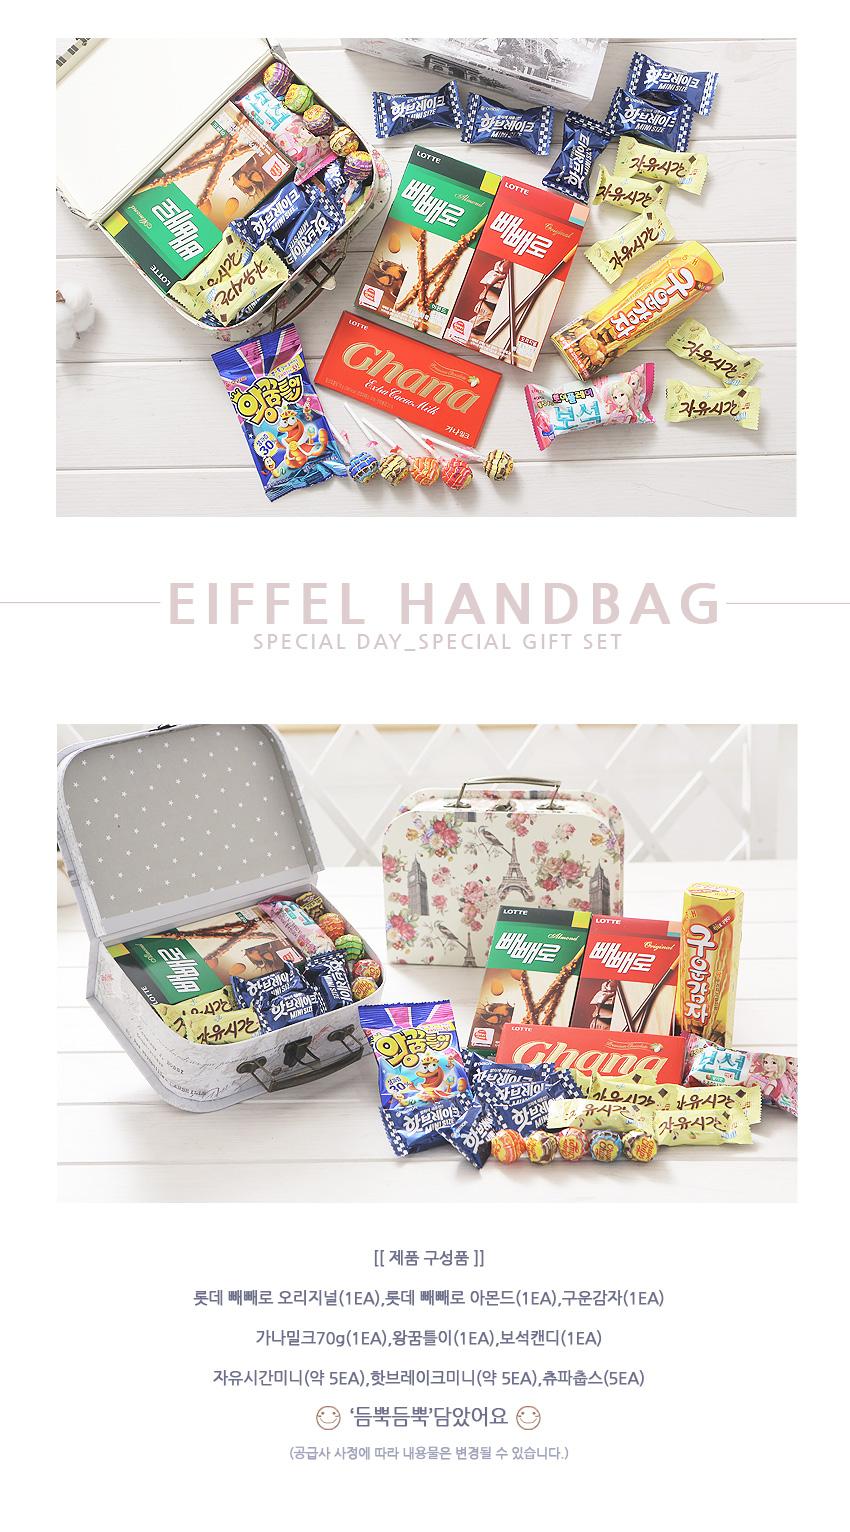 [ Lotte ] Eiffel Handbag(Small)